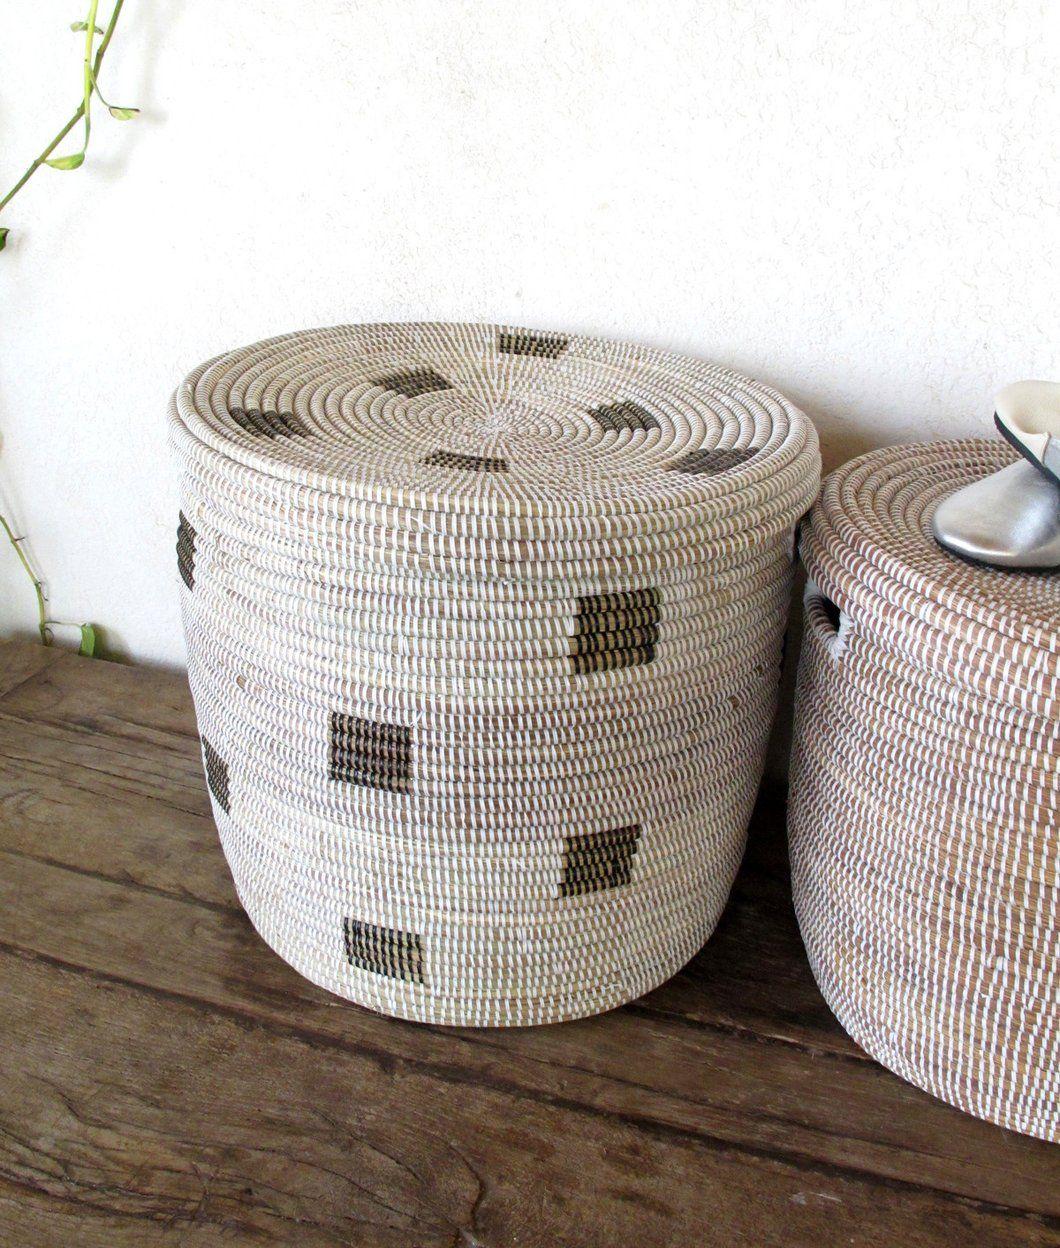 Toy Storage Basket With Flat Lid Organizer Basket Storage Baskets Toy Storage Baskets Toy Storage